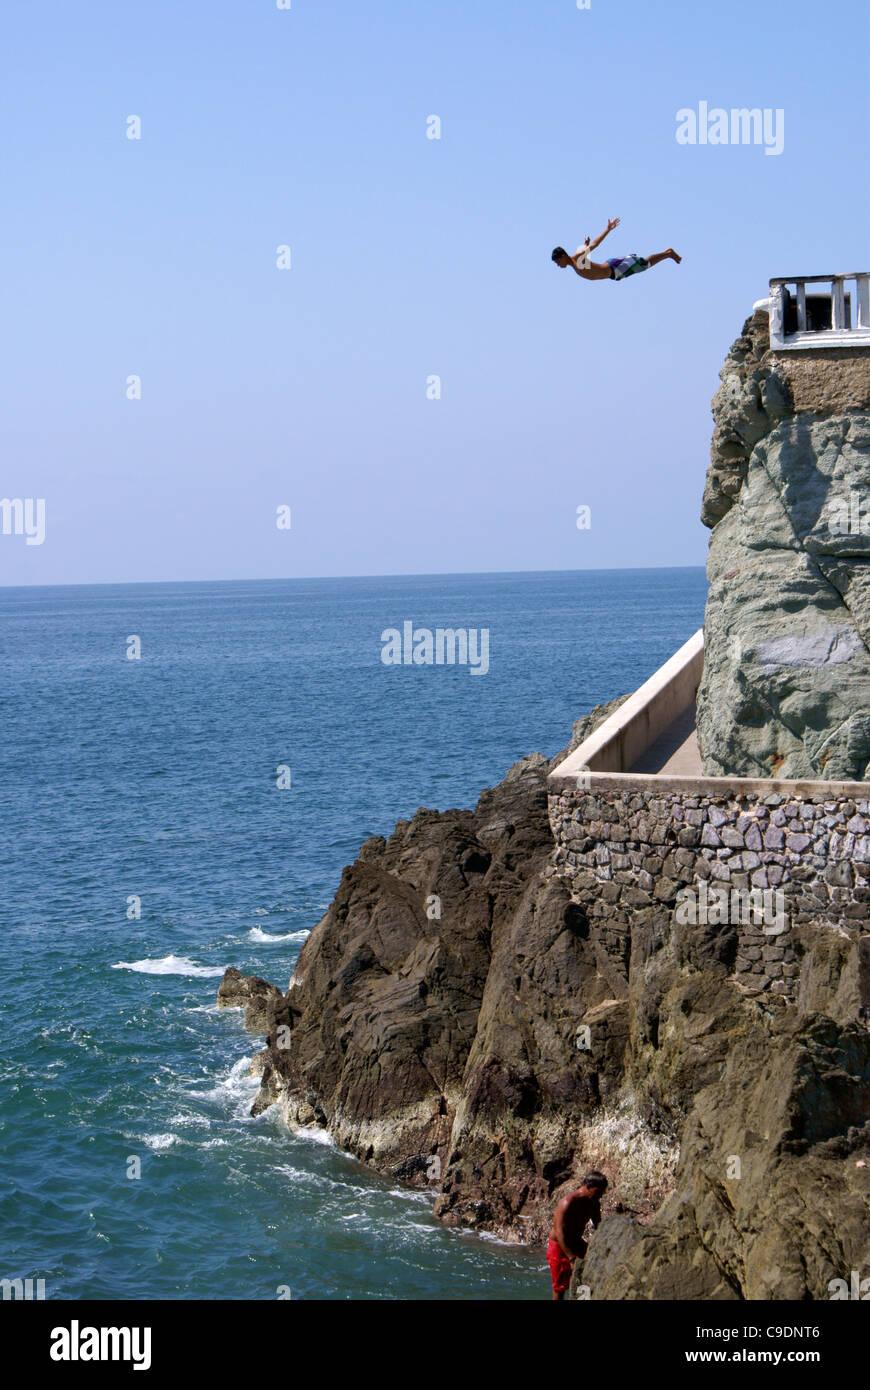 Cliff diver at Punta Clavadista in Mazatlan, Sinaloa, Mexico - Stock Image